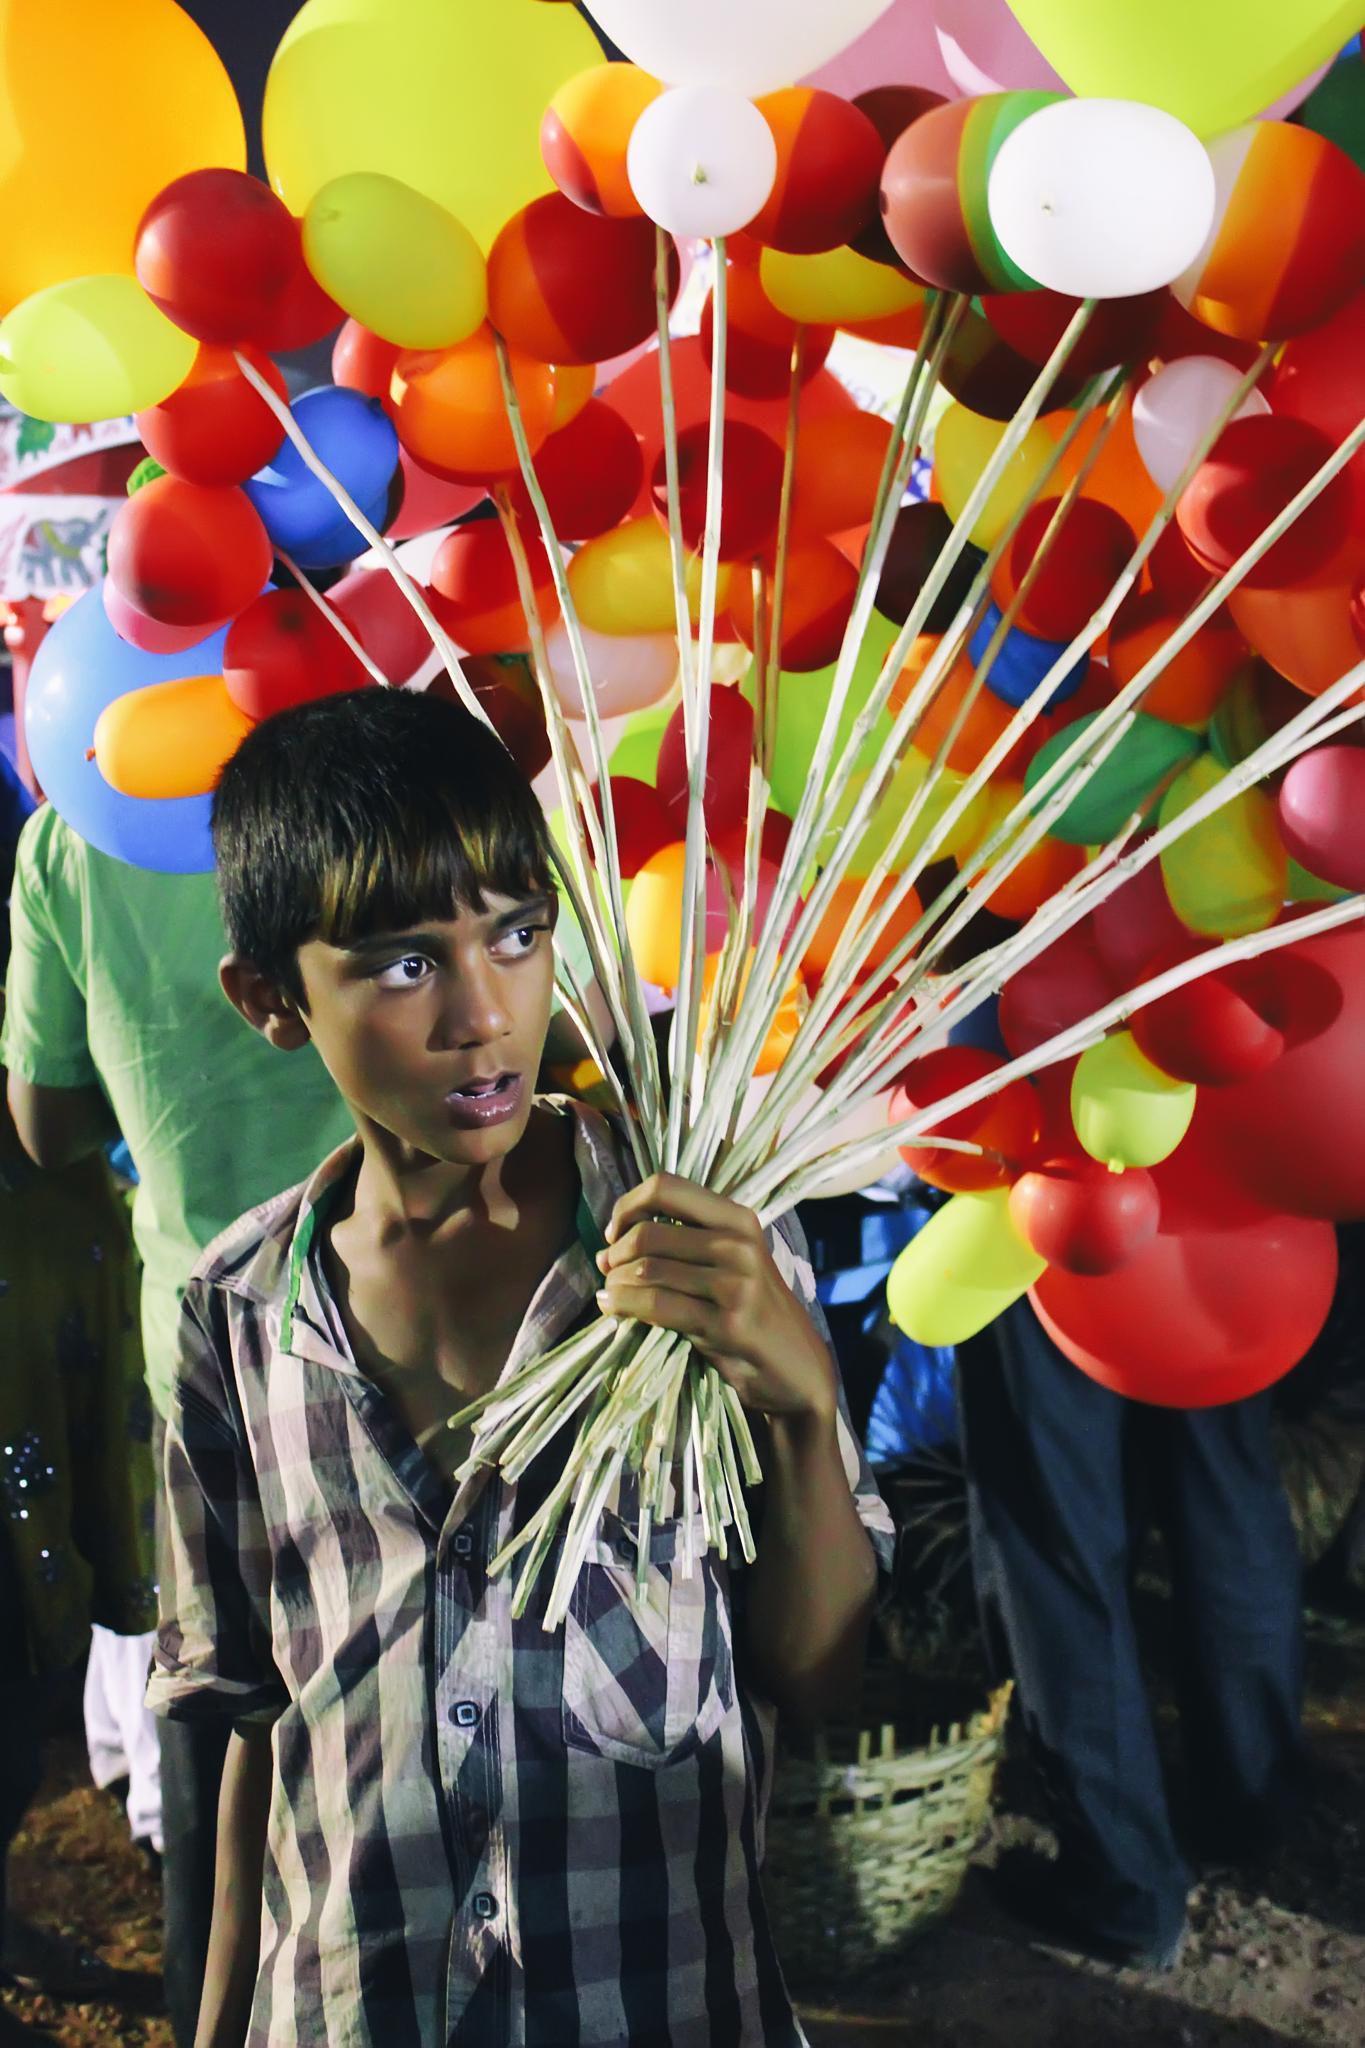 The Baloon Boy by Basudev Majhi